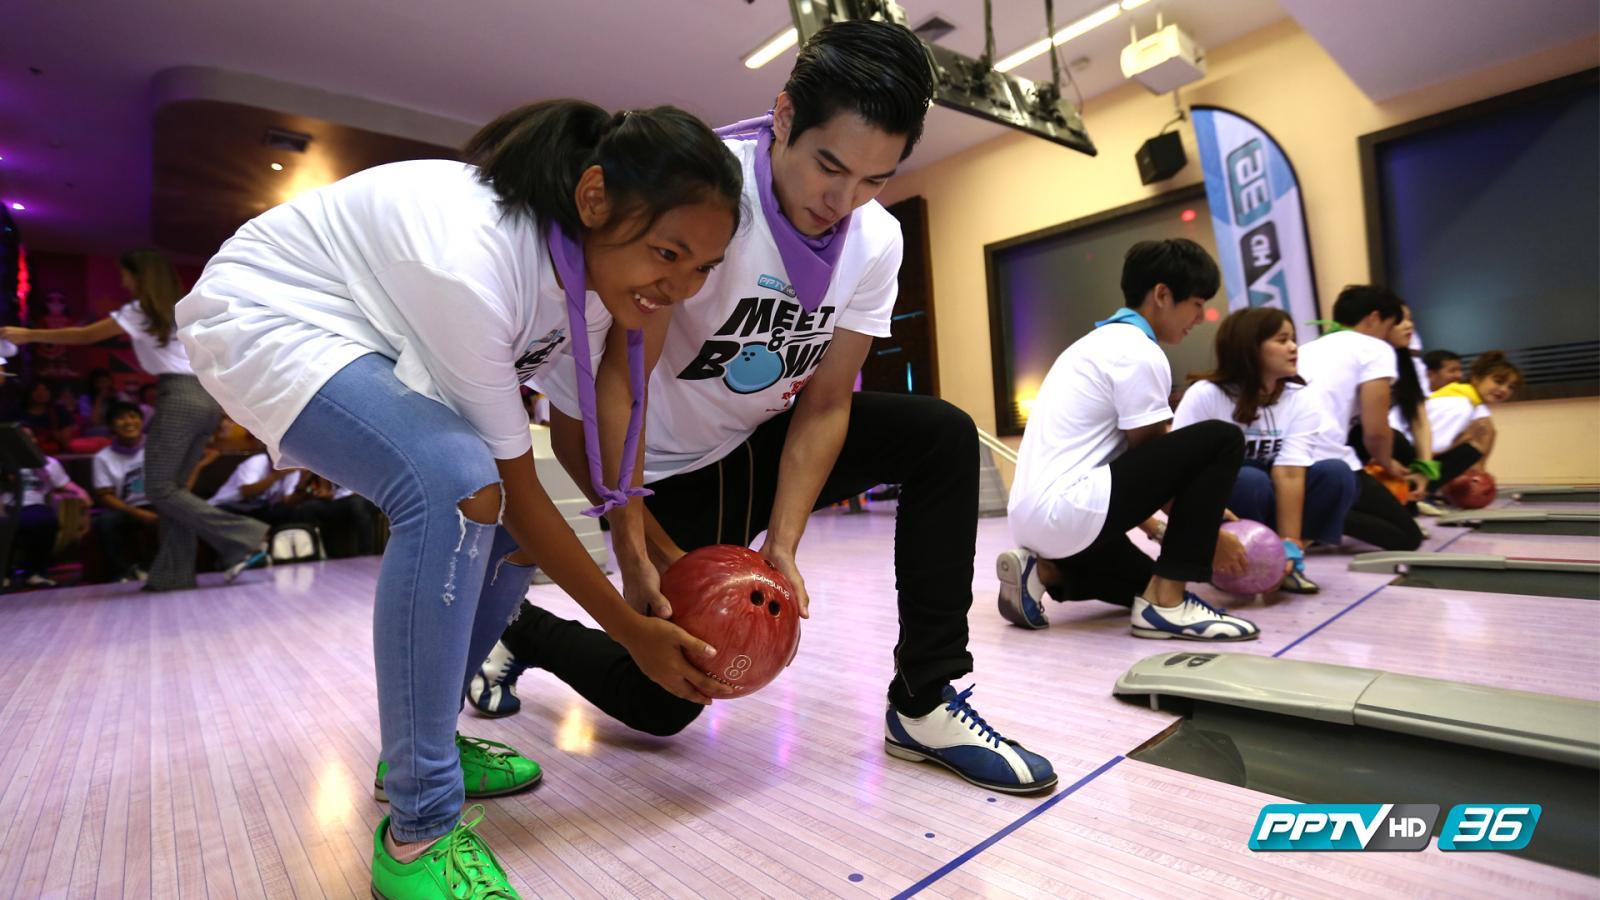 PPTV จัดกิจกรรม Meet & Bowl เอาใจแฟนละคร รักร้อนออนไลน์ เดอะ ซีรีส์